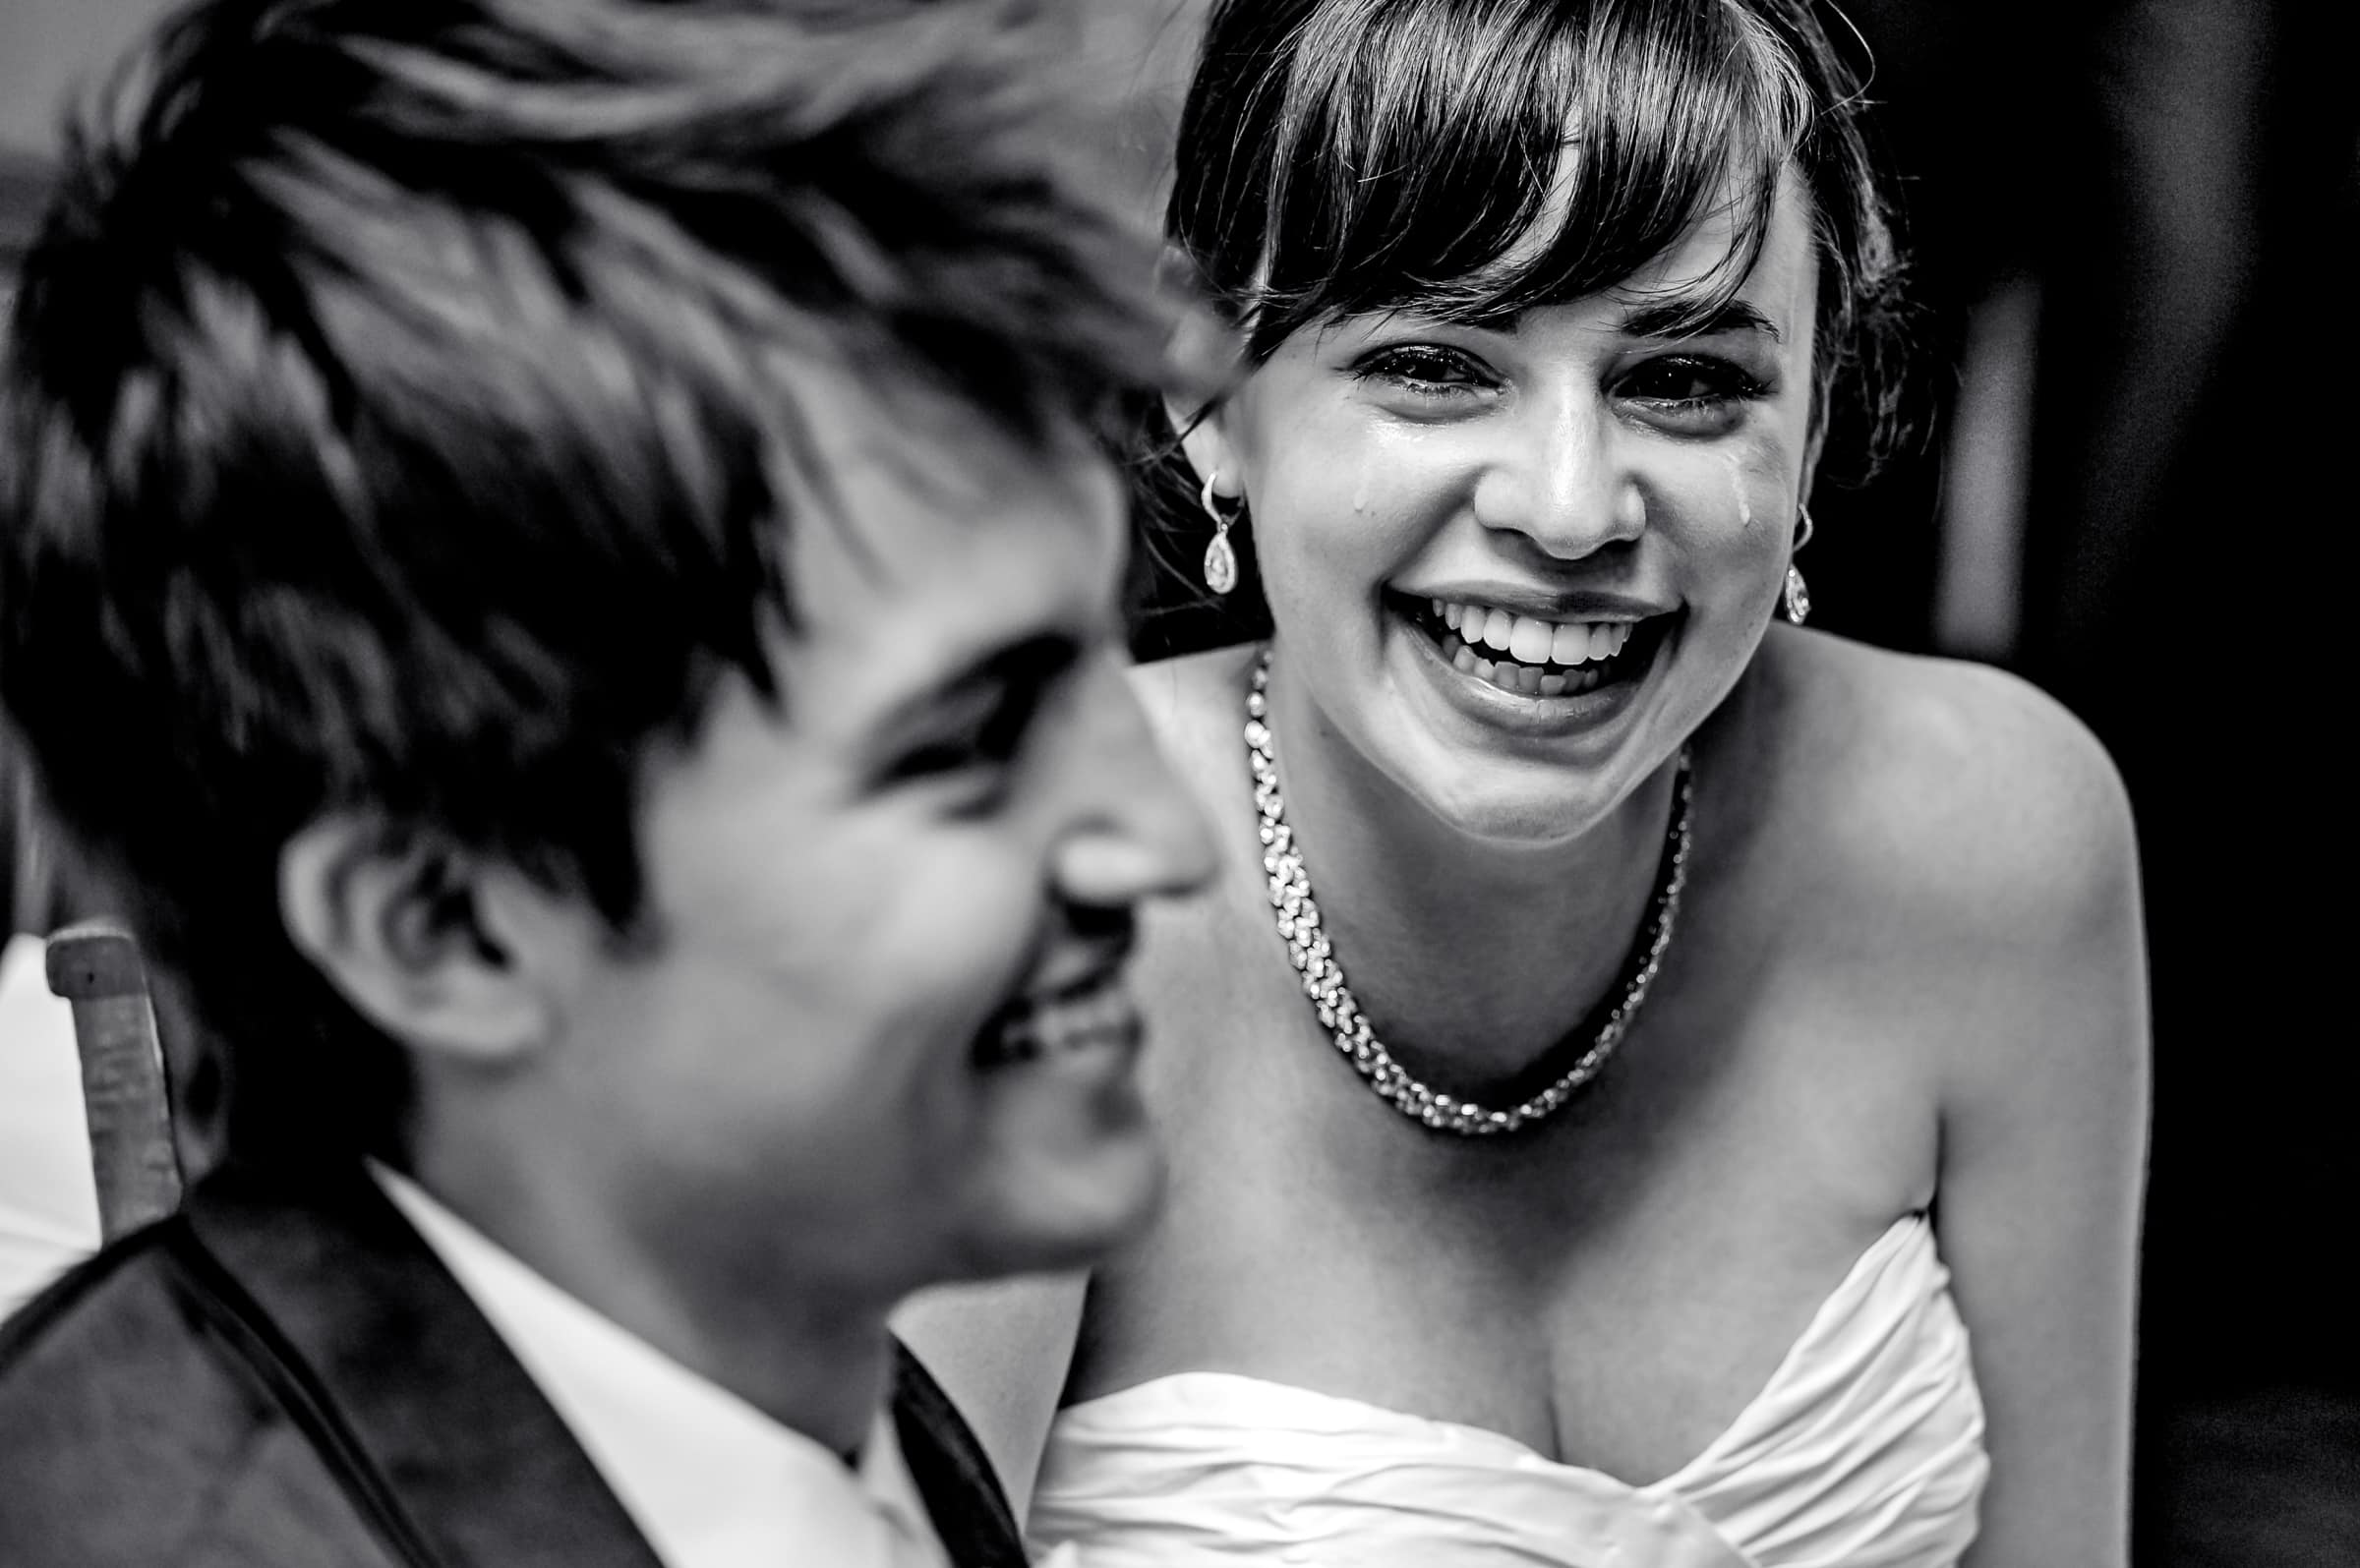 Award winning wedding photo of an emotional bride and groom during their Waverley Country Club wedding reception